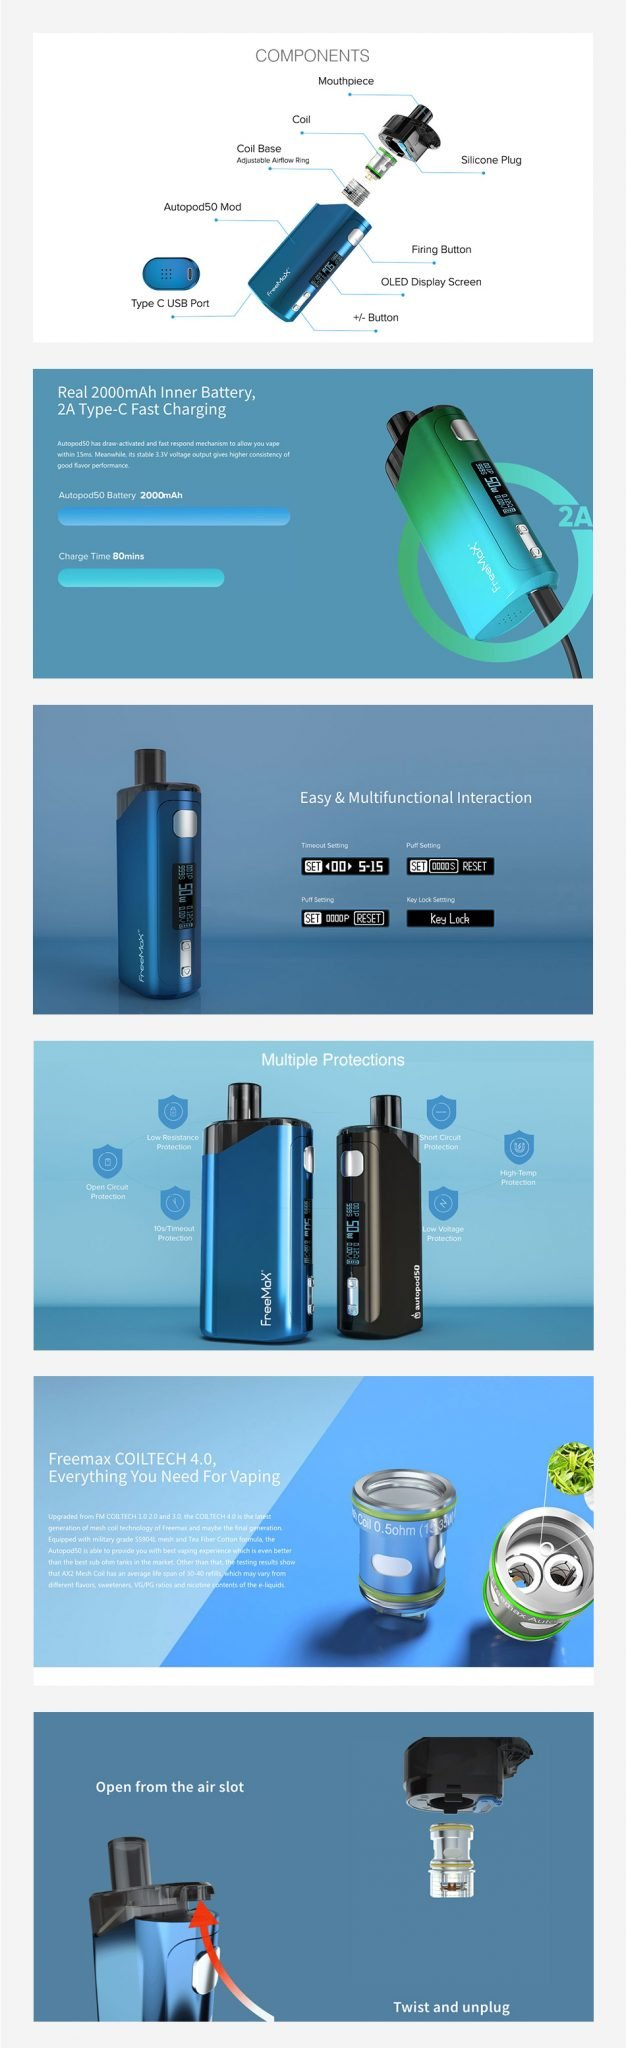 Freemax Autopod50 Features UK